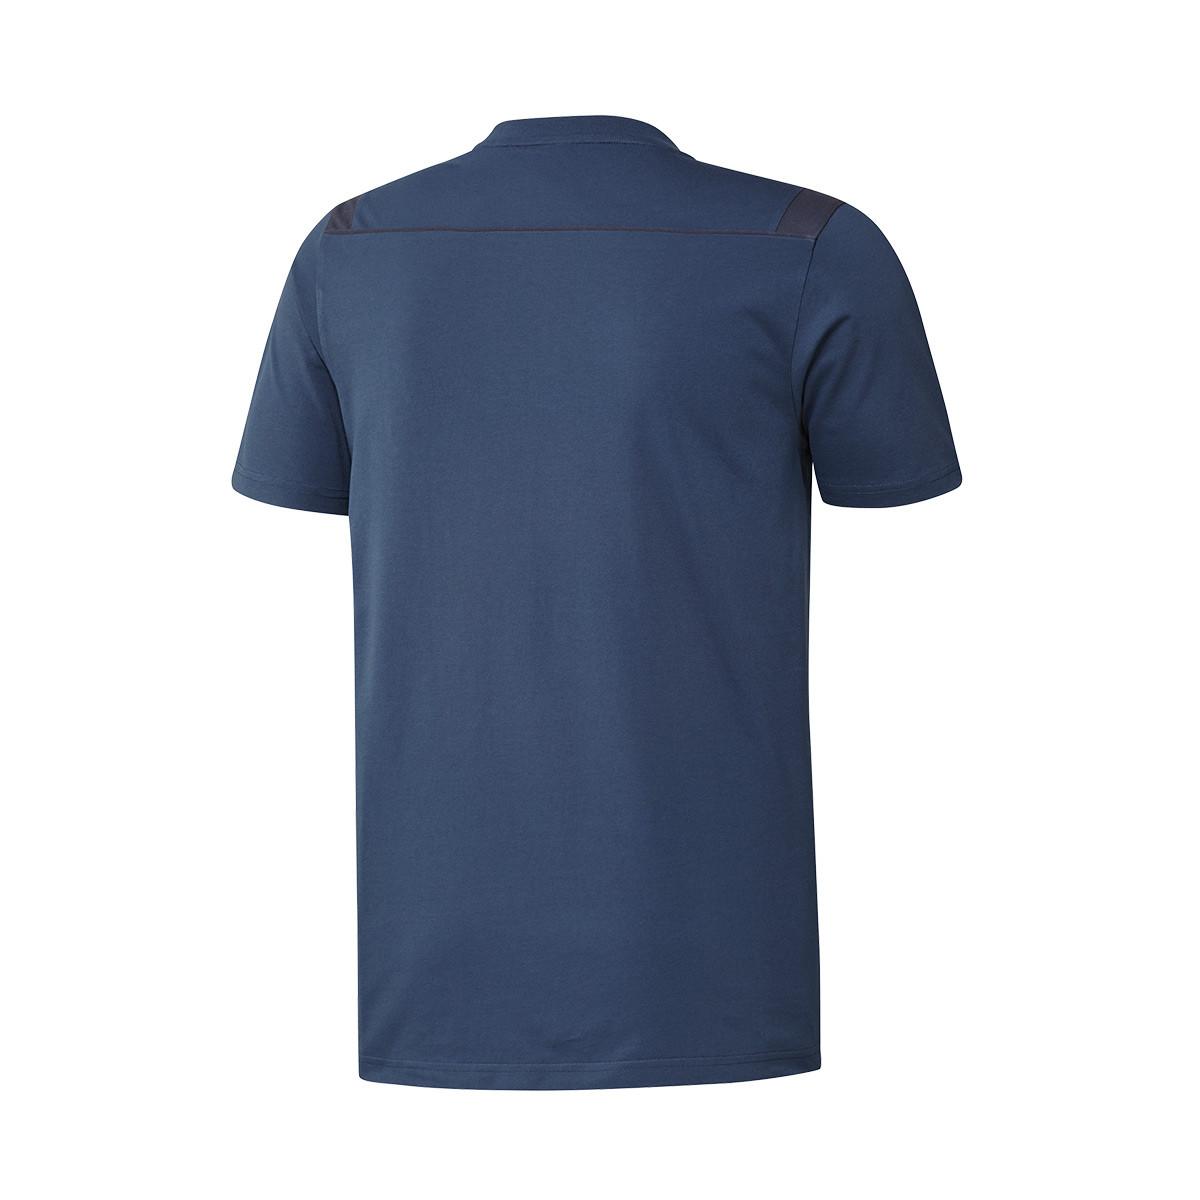 best service 77af4 17658 Camiseta Bayern Munich 2019-2020 Night marine-Trace blue